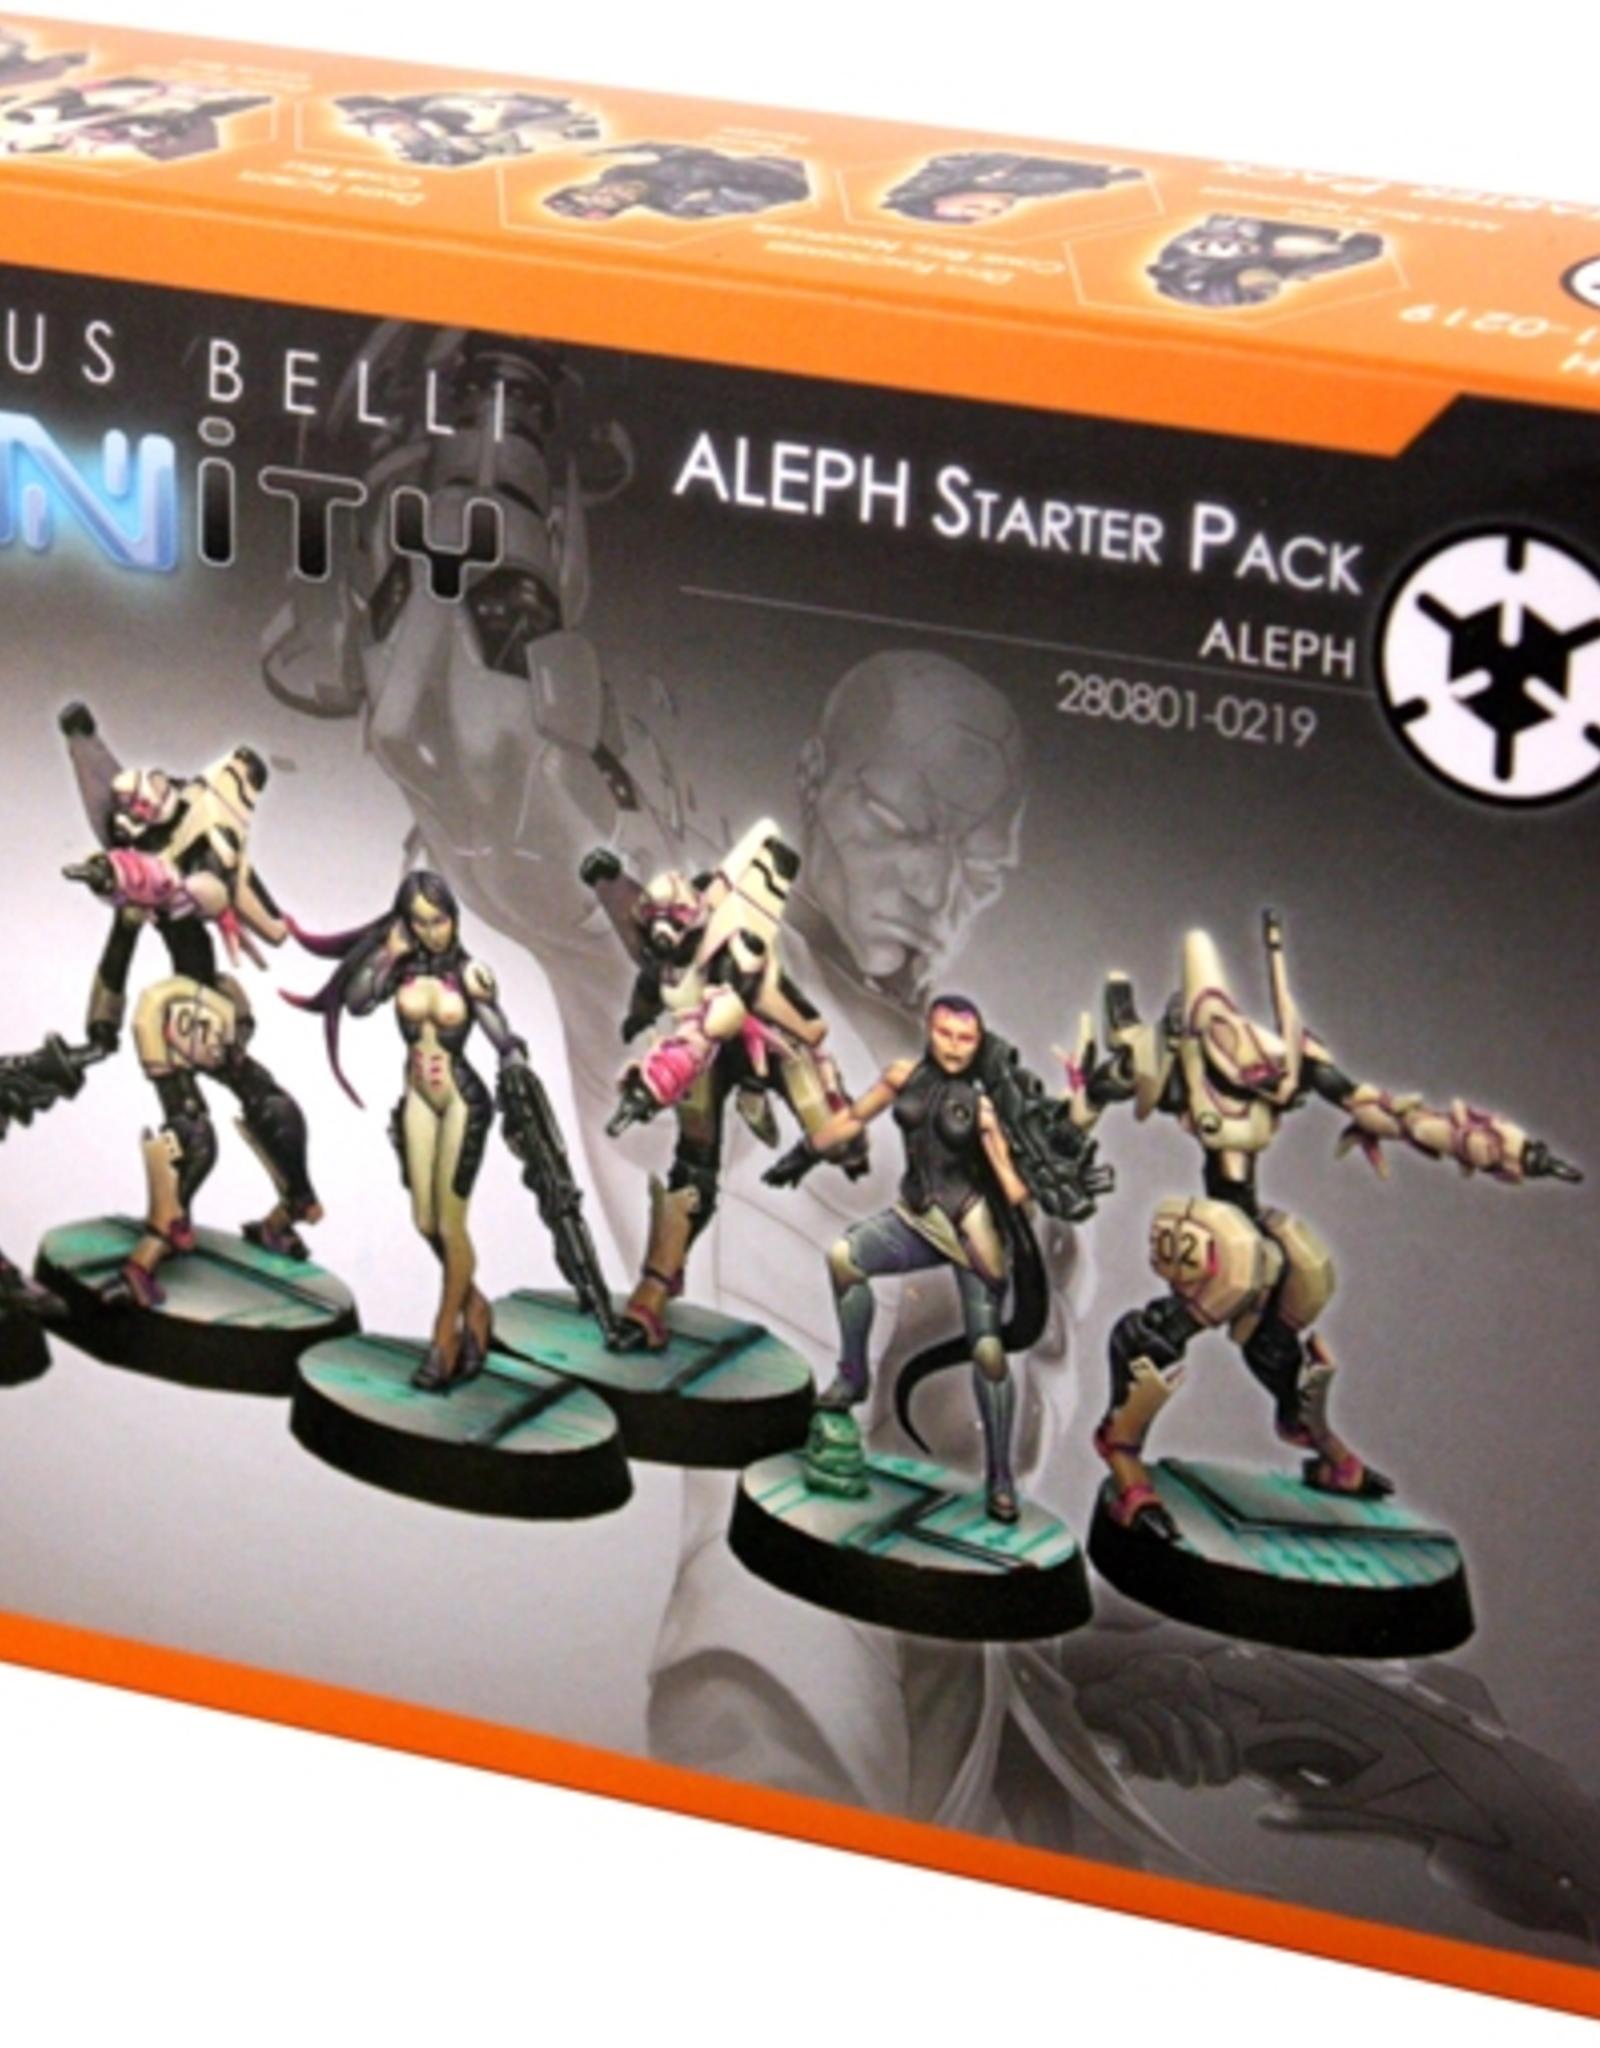 Corvus Belli Aleph Starter Pack